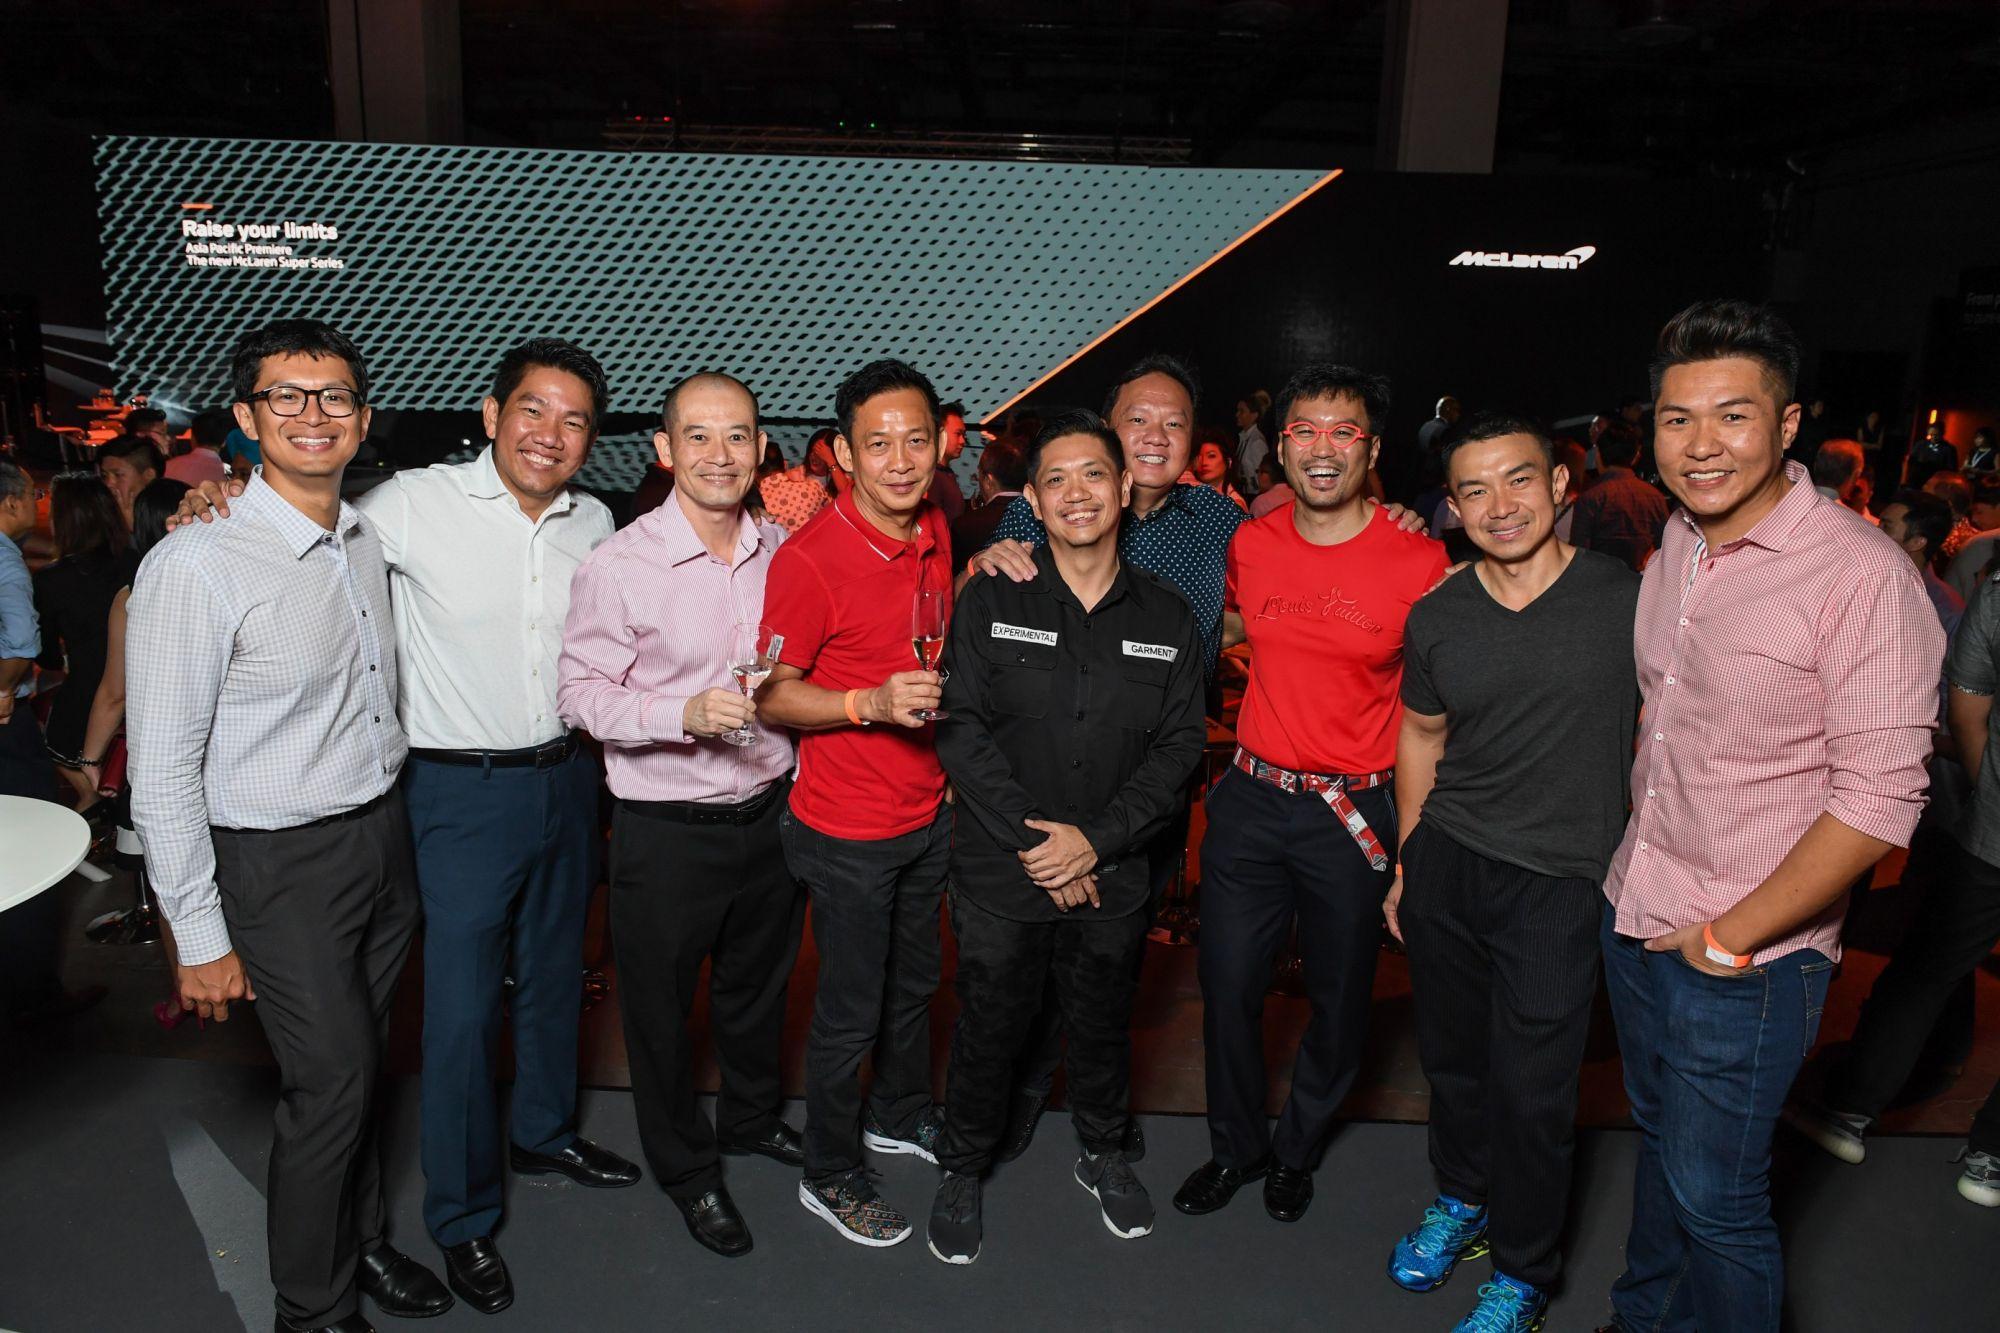 Azim Hassanbhai, George Kong, Chris Lim, Charlie Lee, Stanley Ng, Ho Kok Sen, Roger Chng, Roland Chong, Kelvin Teo